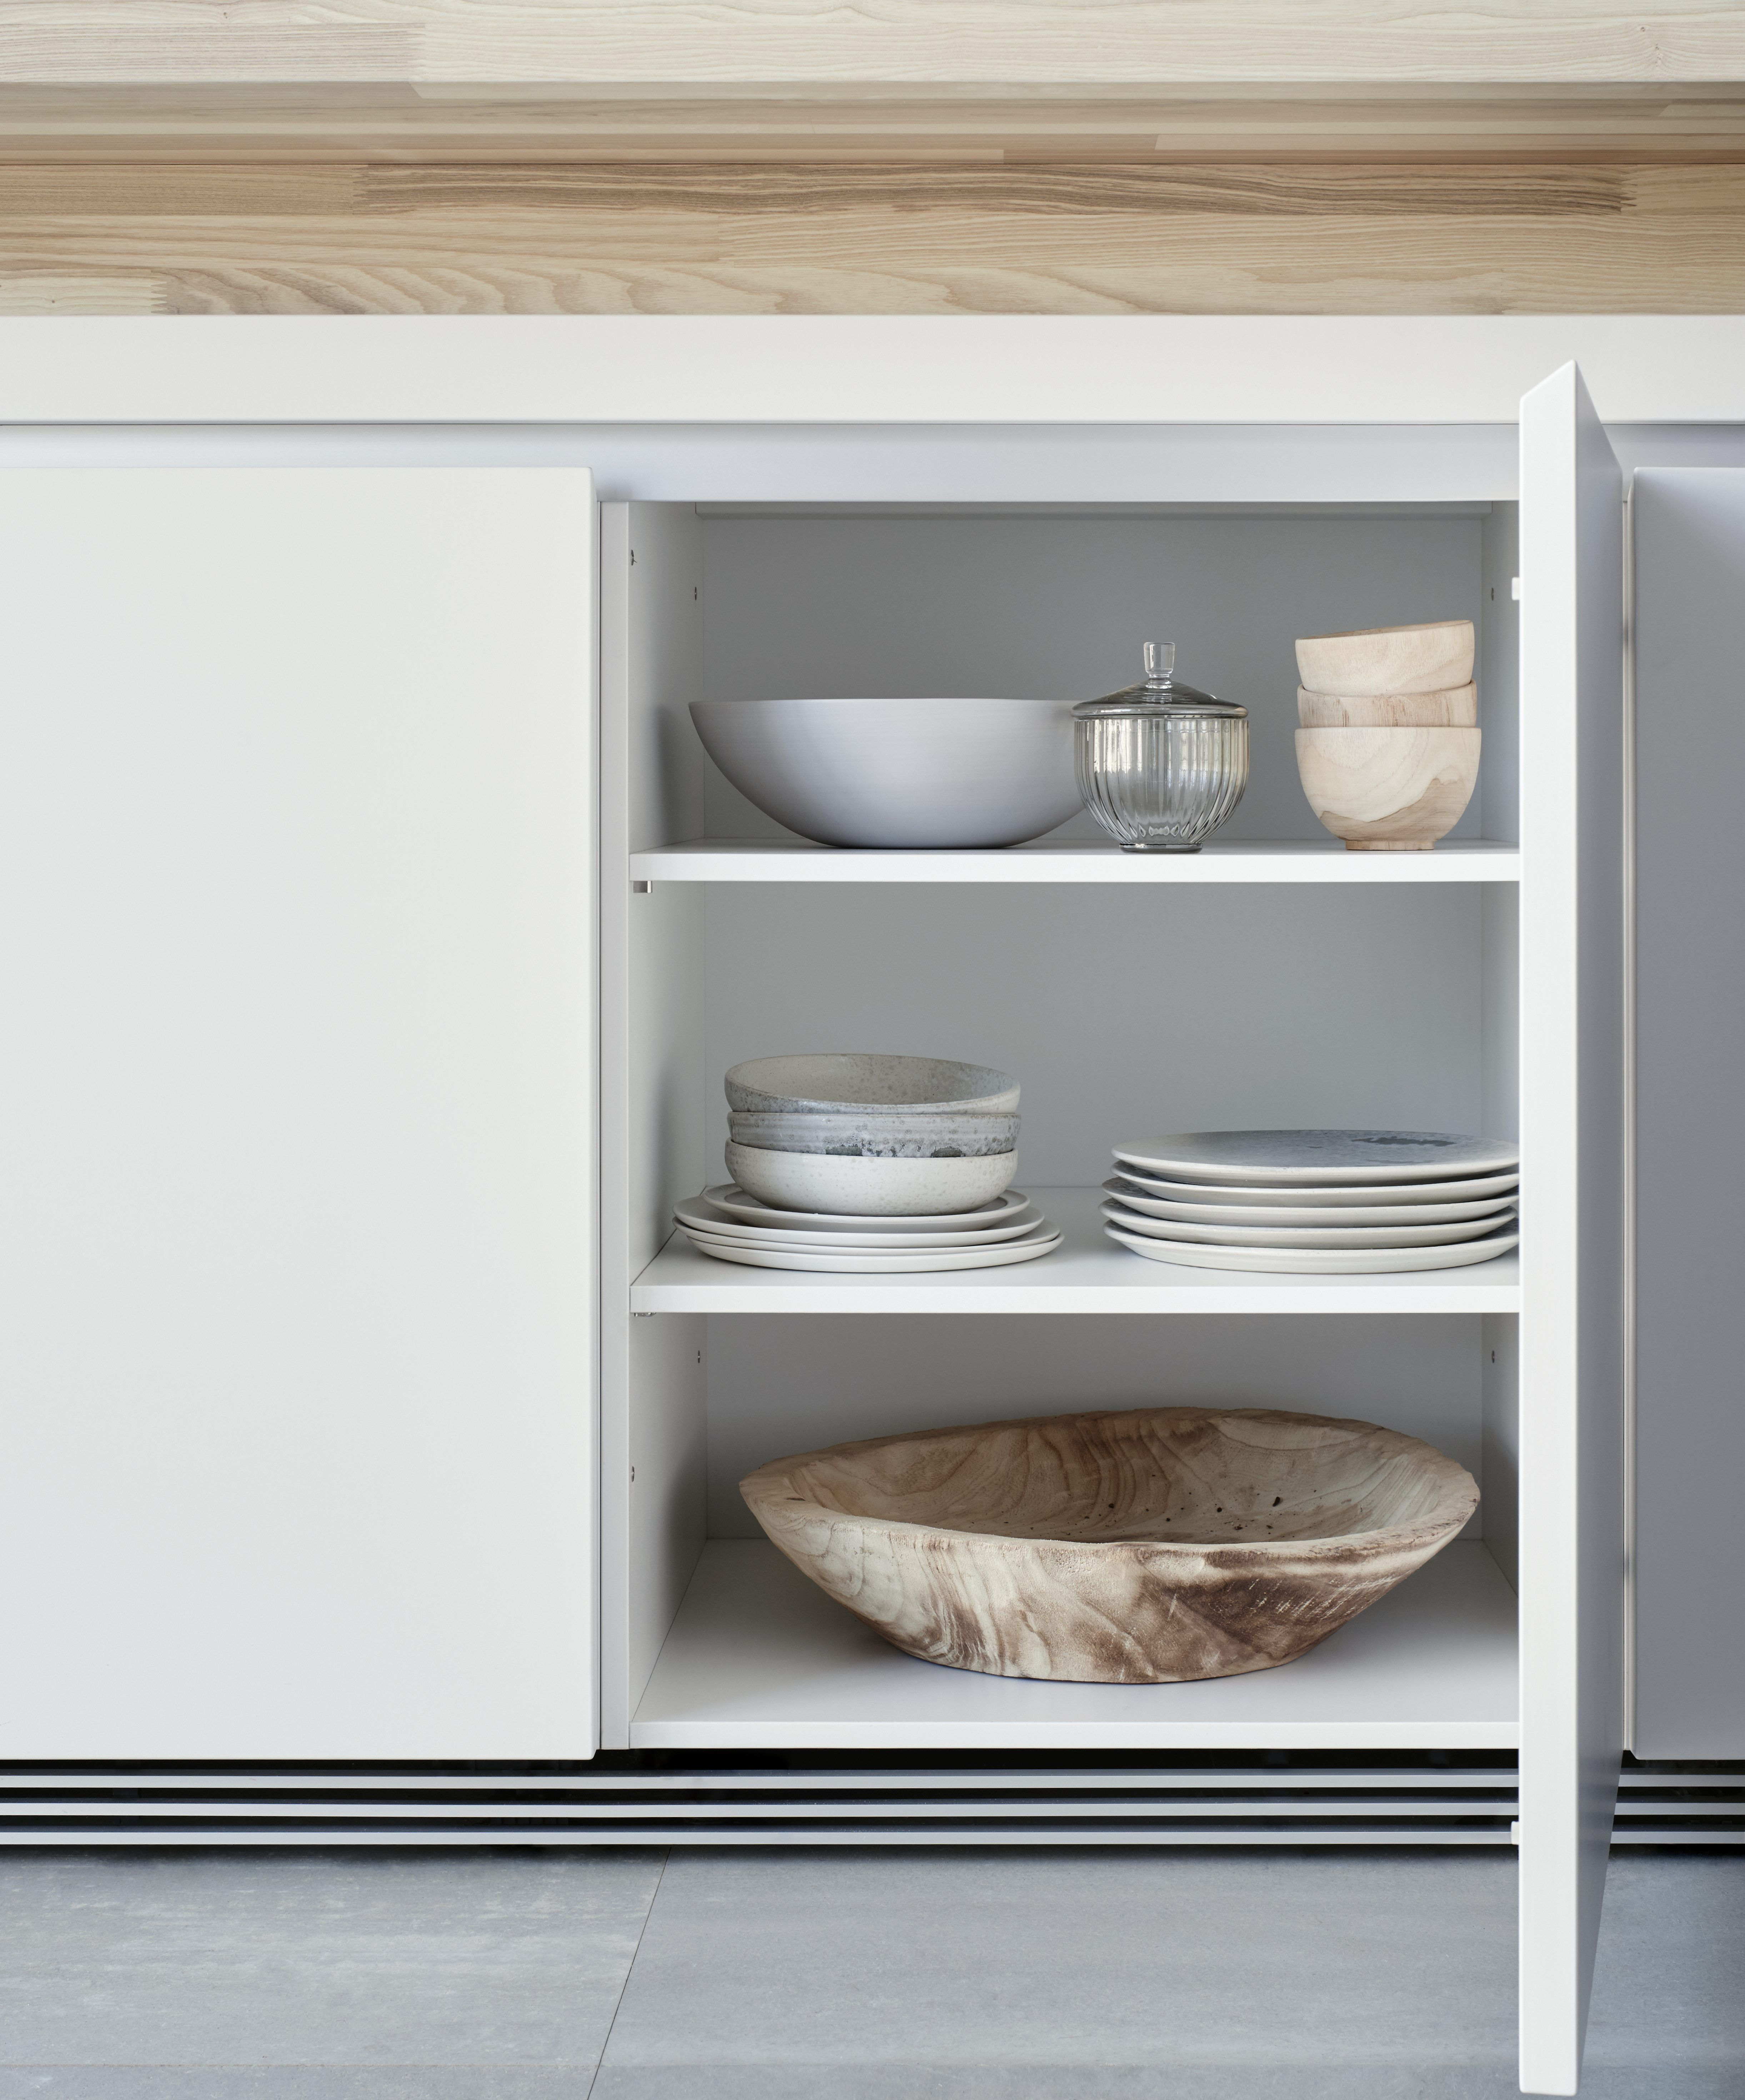 bulthaup b1 kitchen white pinterest kitchen. Black Bedroom Furniture Sets. Home Design Ideas